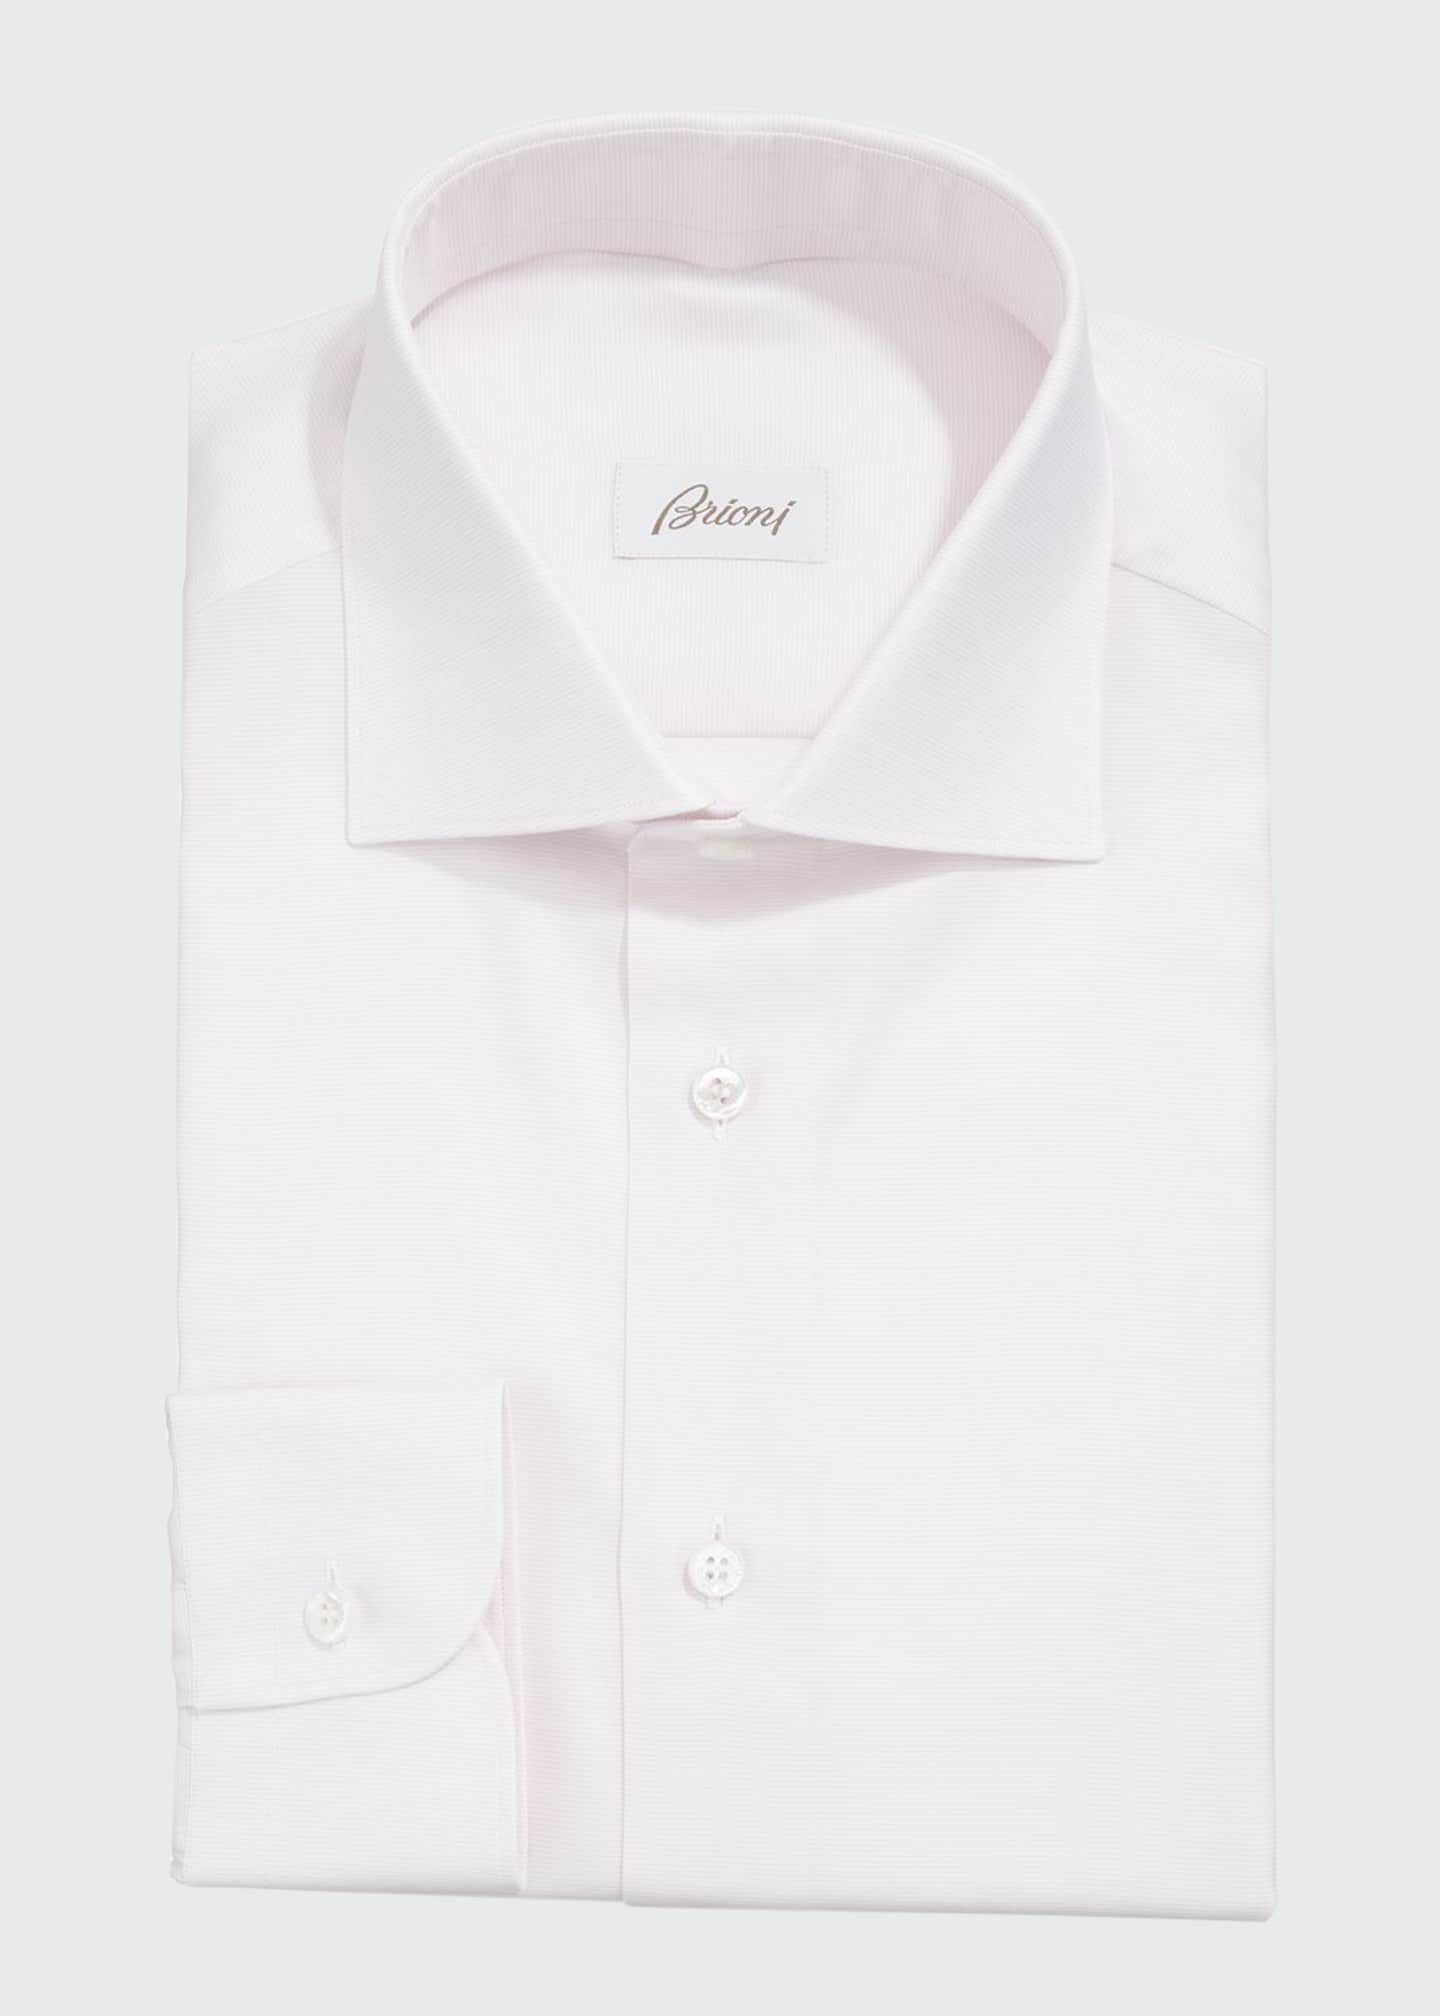 Brioni Men's Ottoman Dress Shirt